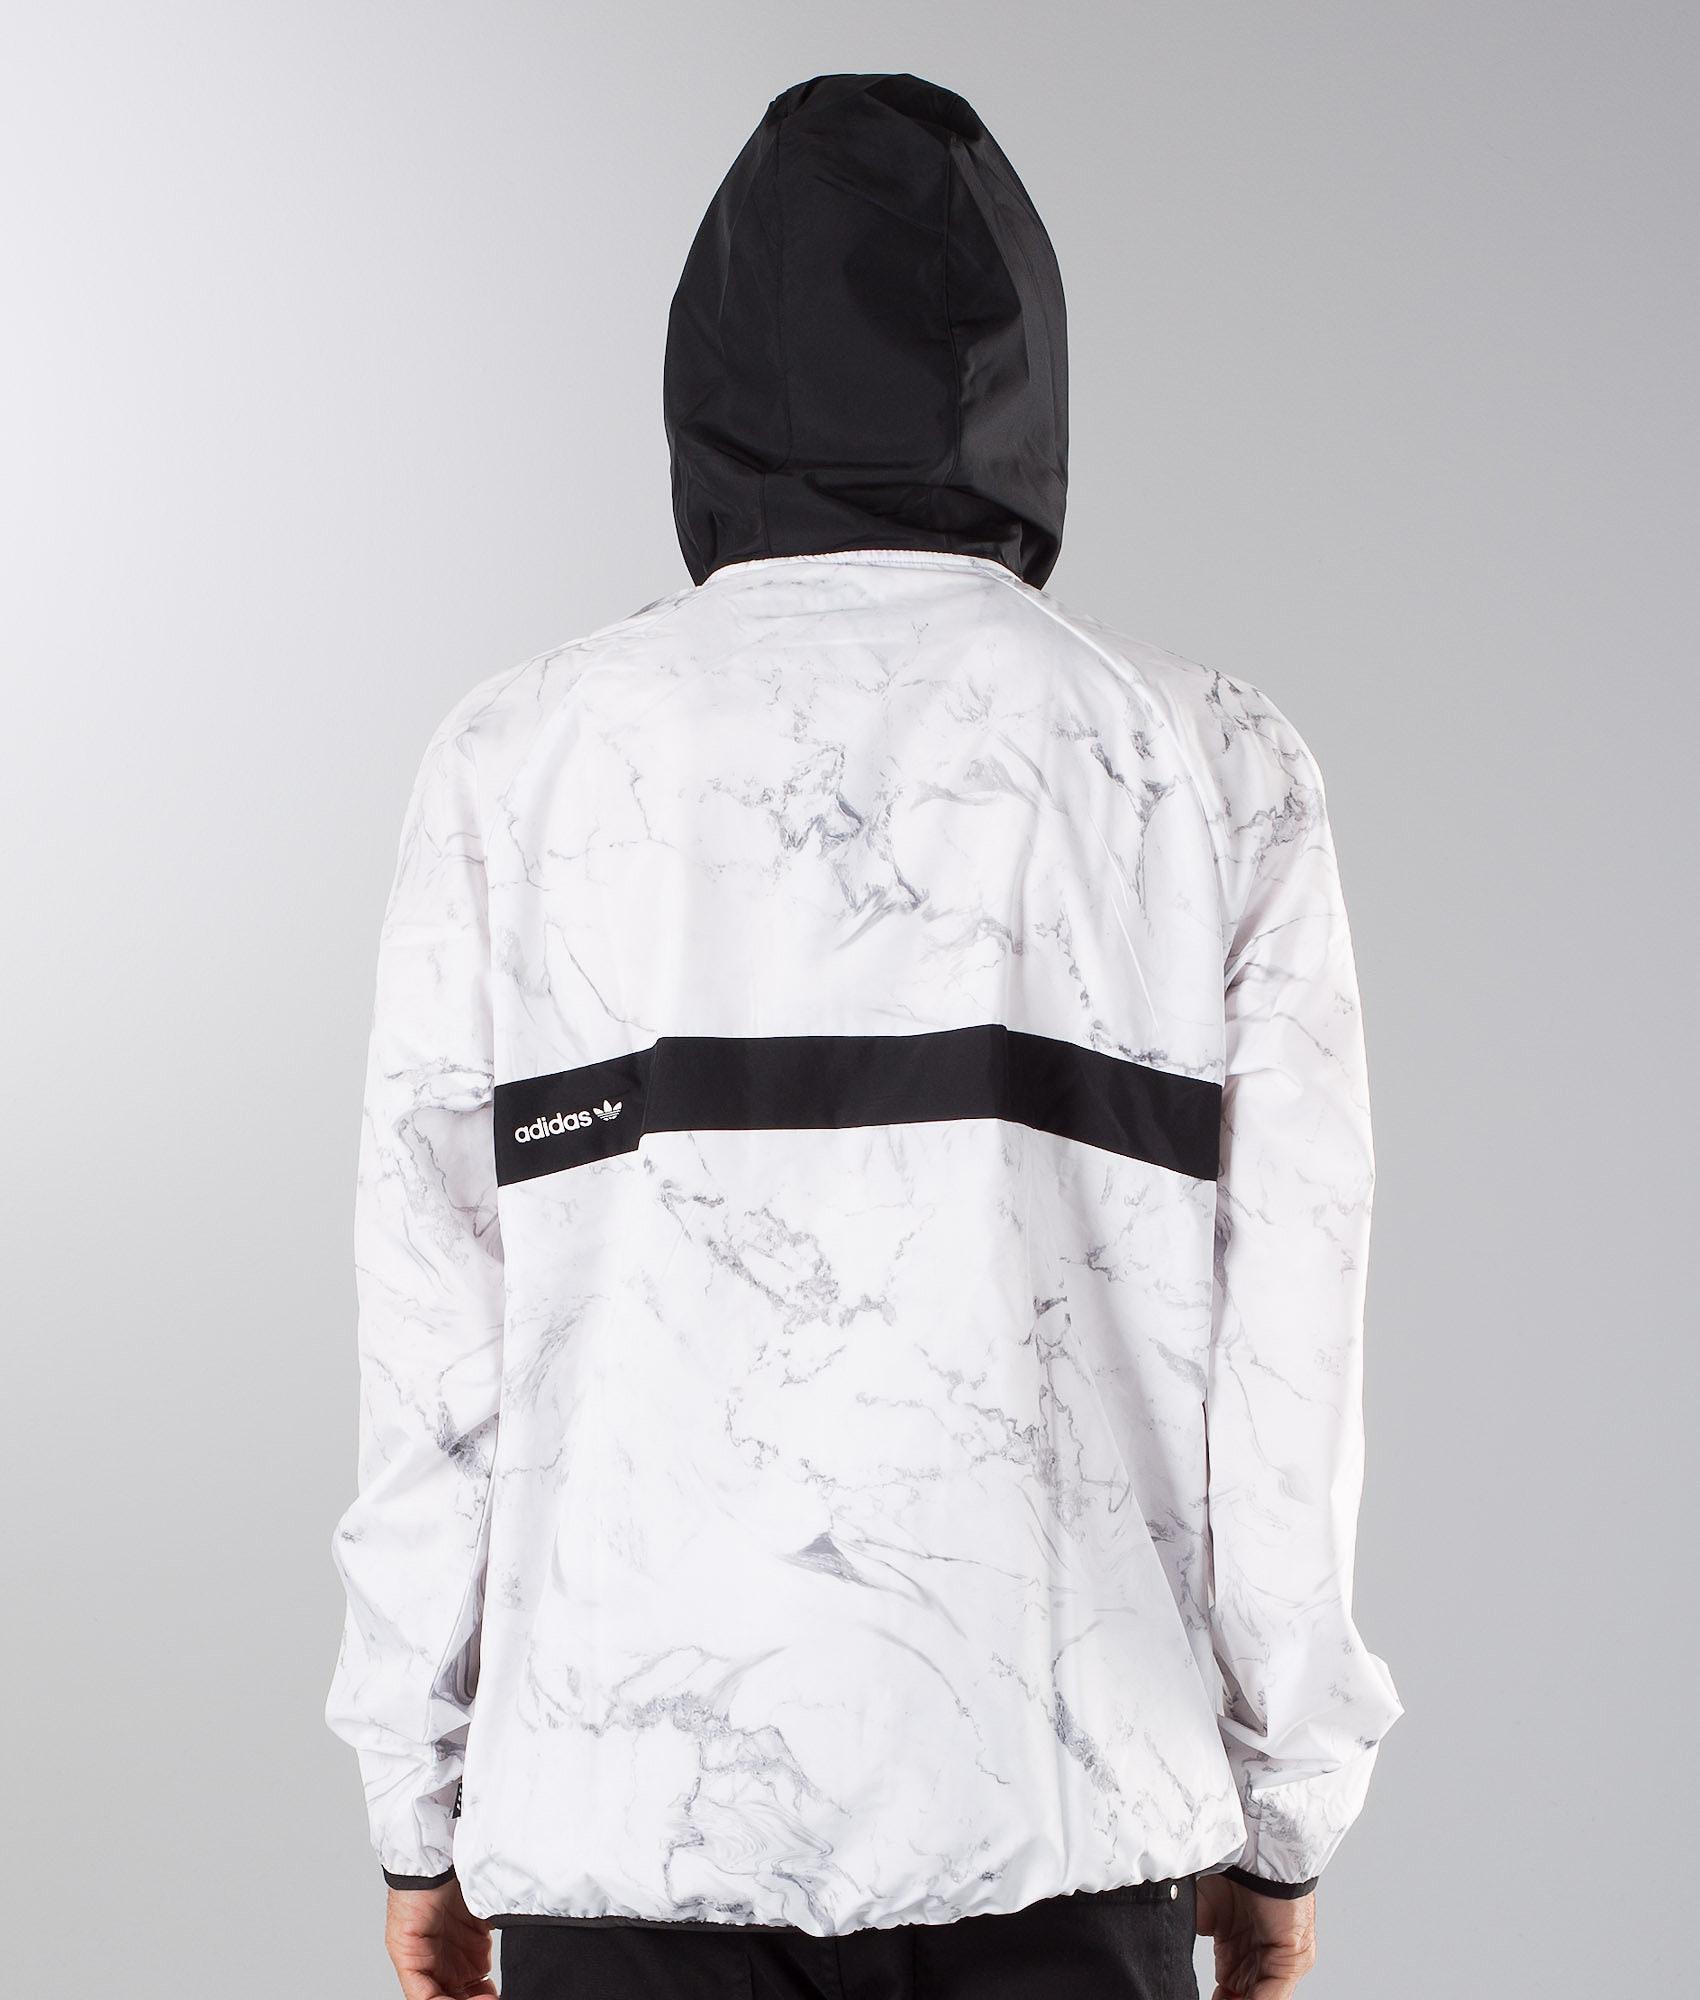 42bf99efd Adidas Skateboarding Marble Blackbird Packable Jacket White/Dgsogr ...